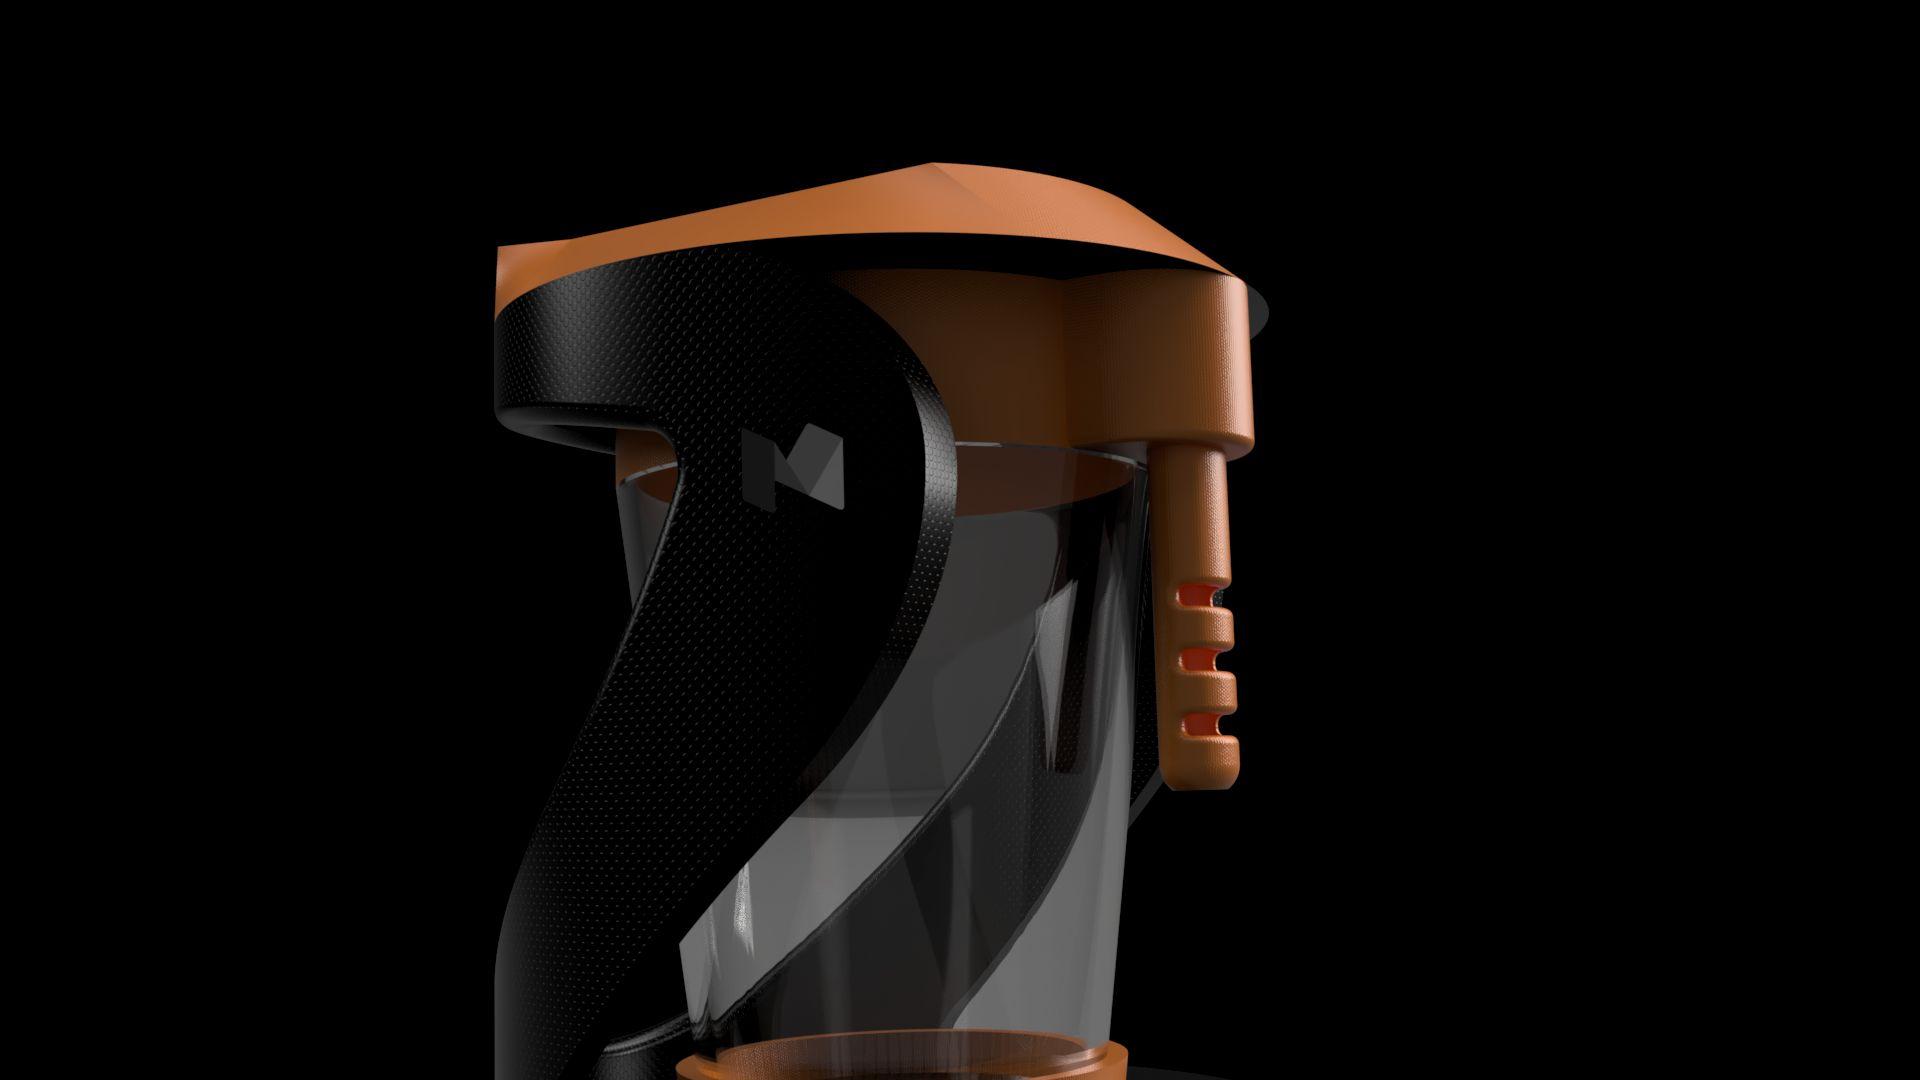 Liq-design-lcs2018-fabrica-de-nerdes-4-3500-3500